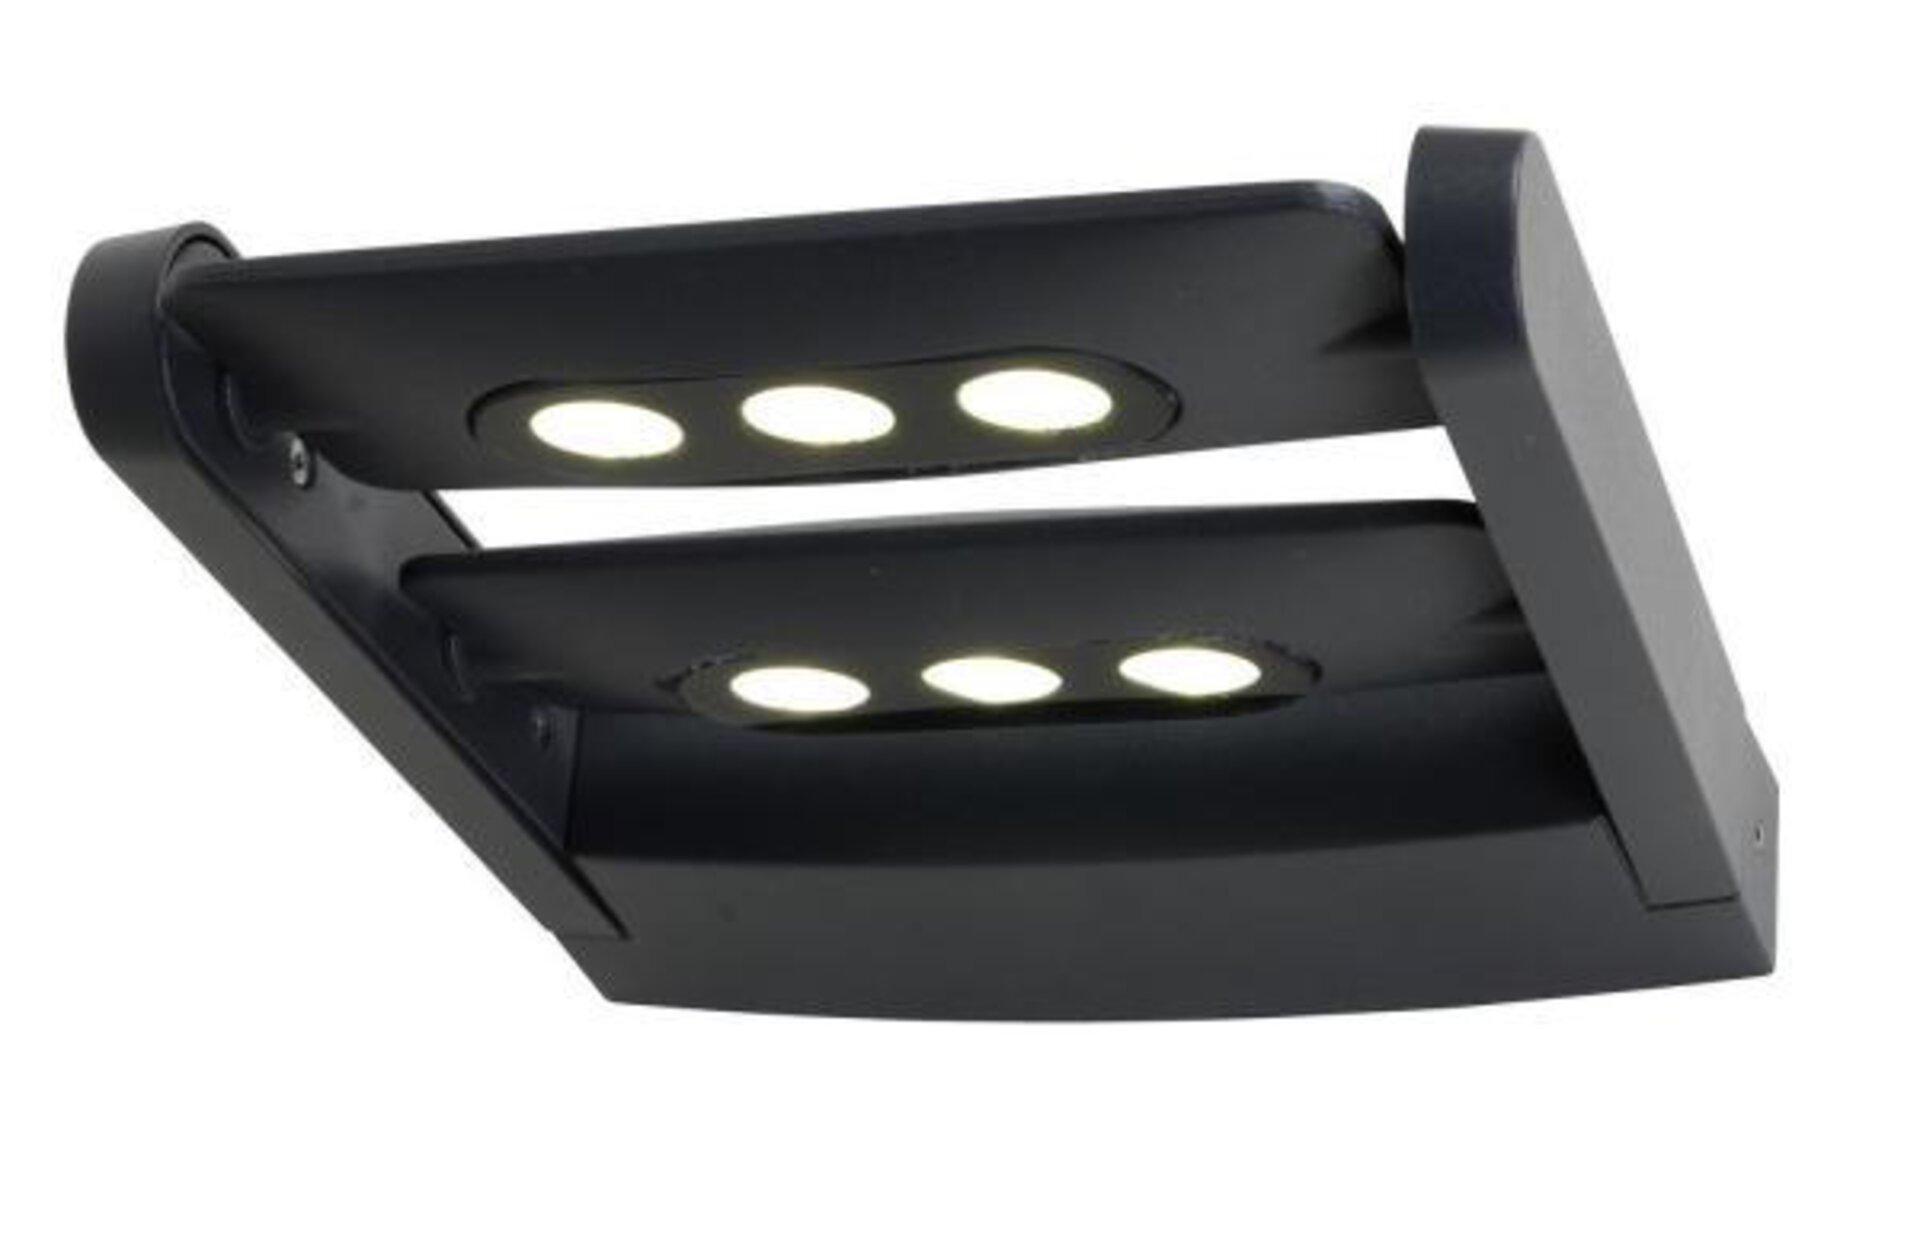 Wand-Aussenleuchte Mini LEDSpot Eco-Light Metall 21 x 5 x 25 cm